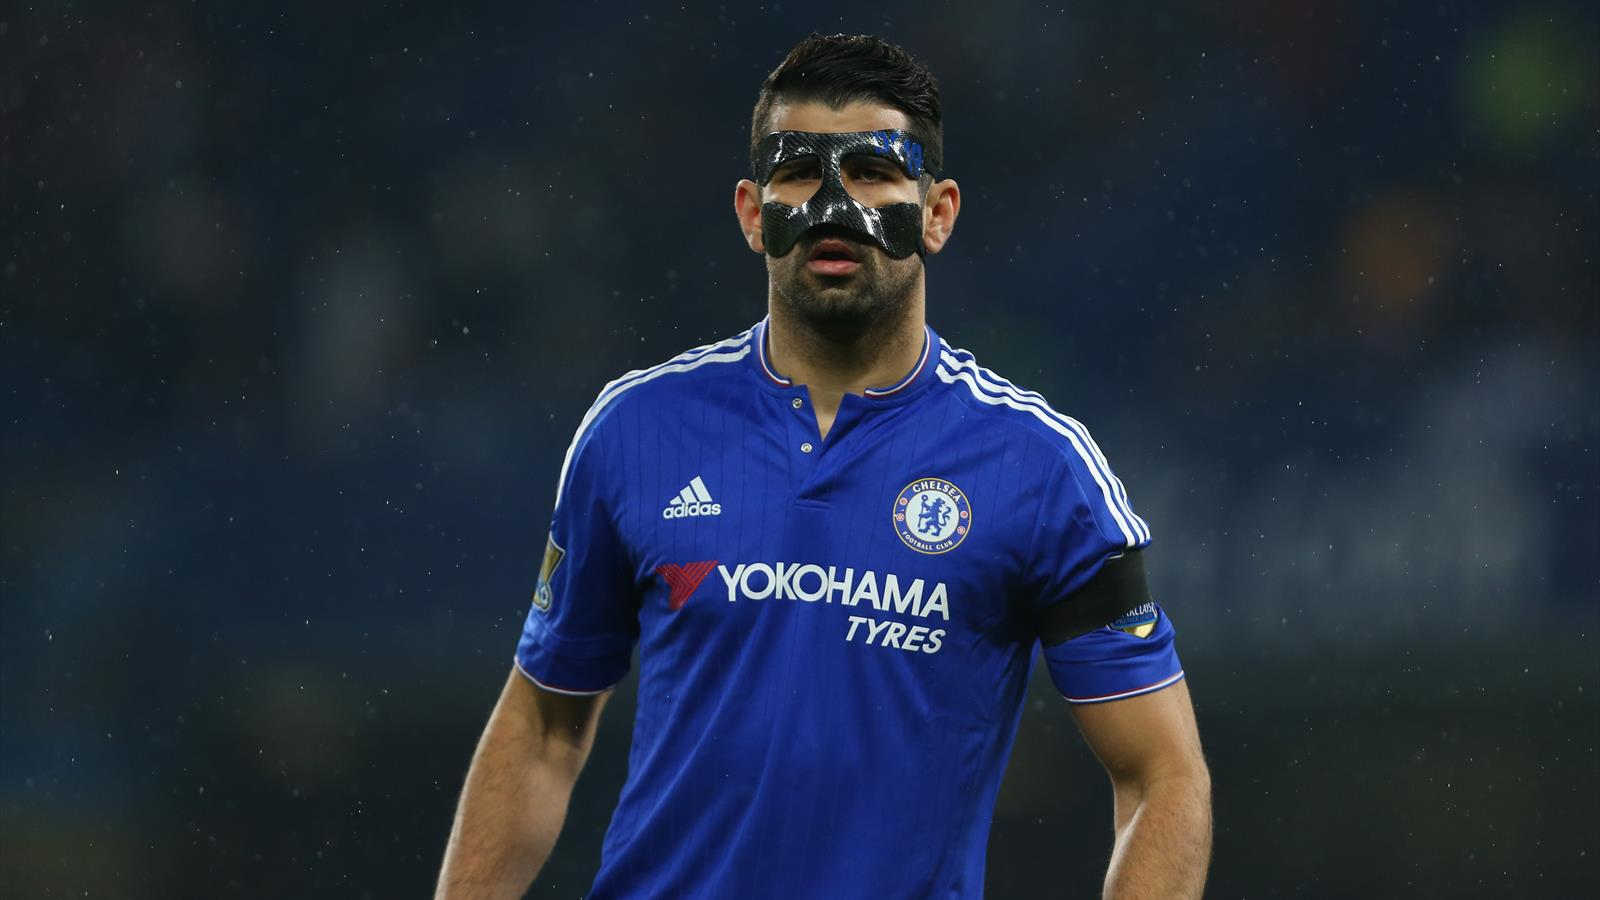 Защитник «Челси» Фикайо Томори вспомнил, как сломал нос Диего Косте